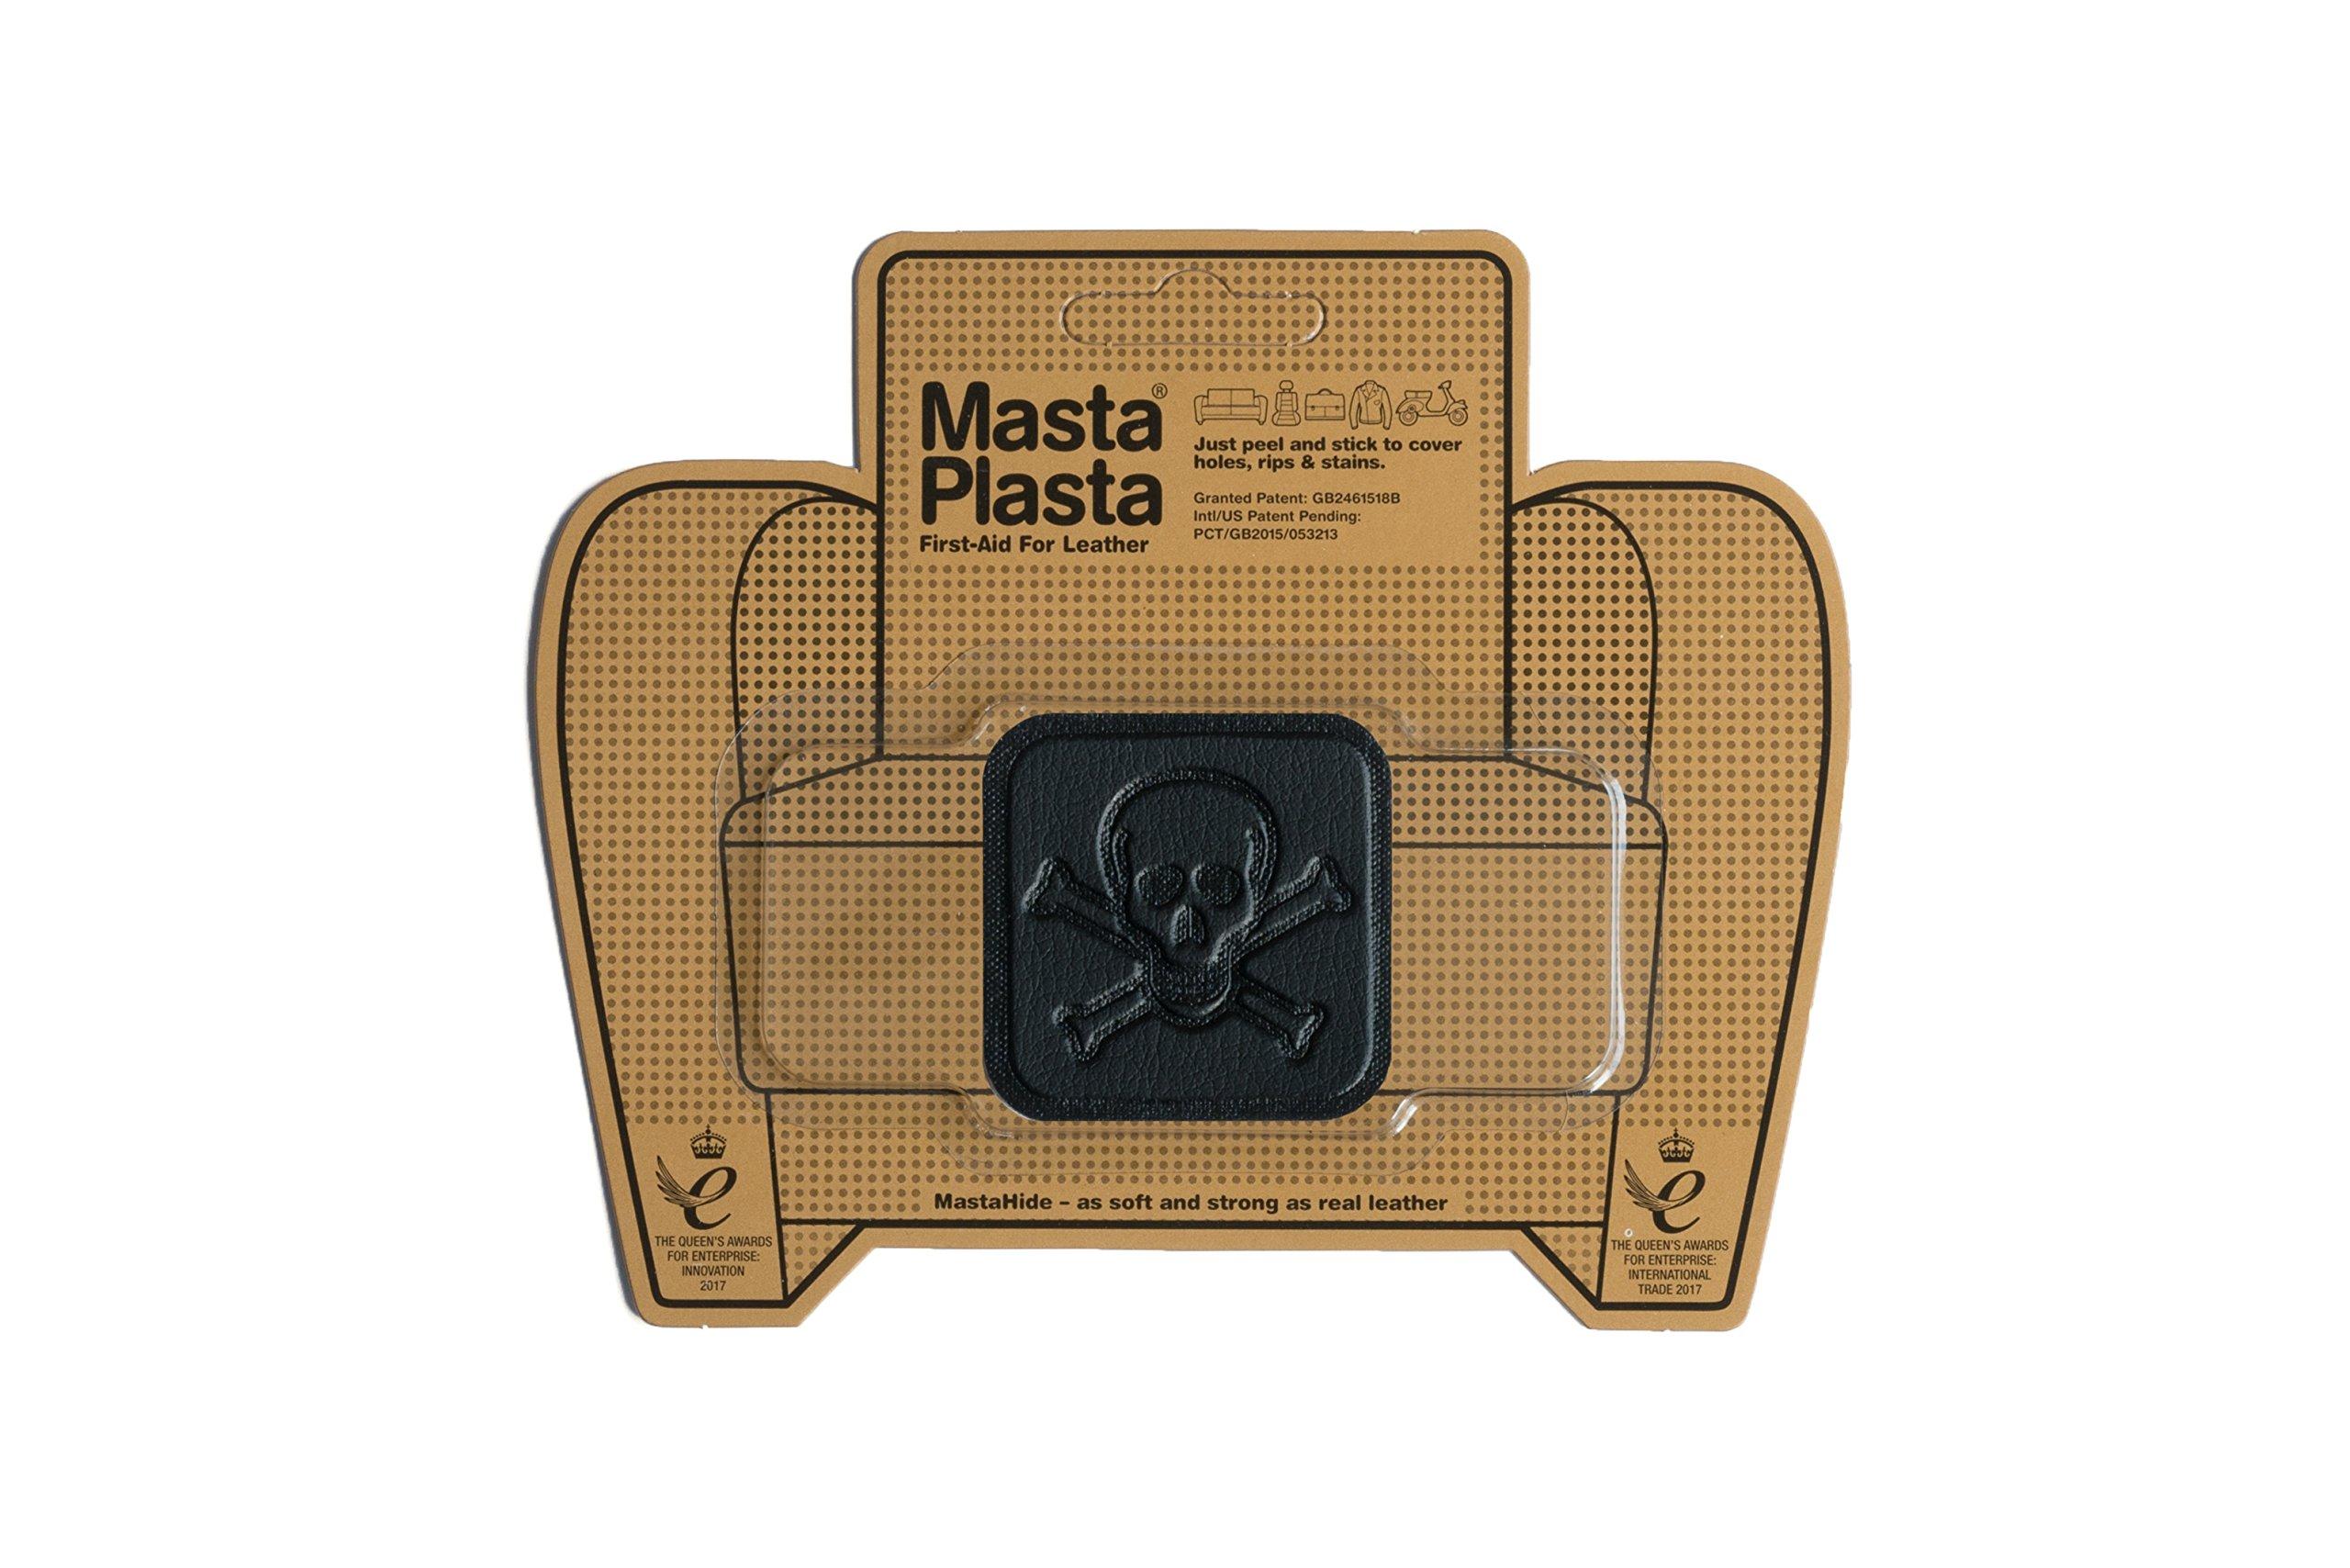 MastaPlasta Self-Adhesive Patch for Leather and Vinyl Repair, Pirate, Black - 2 x 2 Inch by MASTAPLASTA